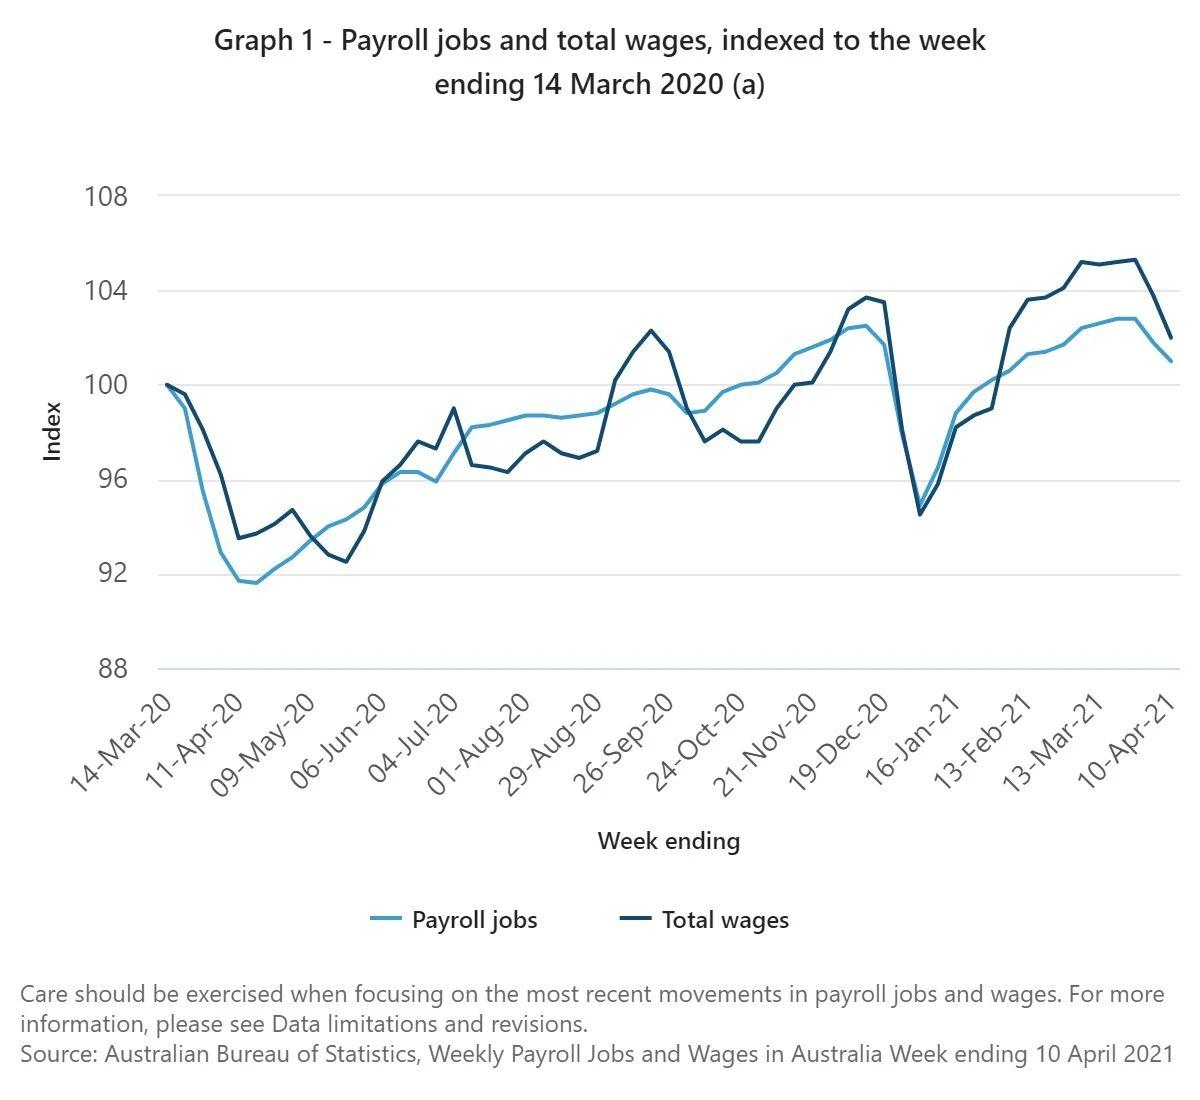 COVID-19之后澳洲工作和薪资都有哪些变化呢?